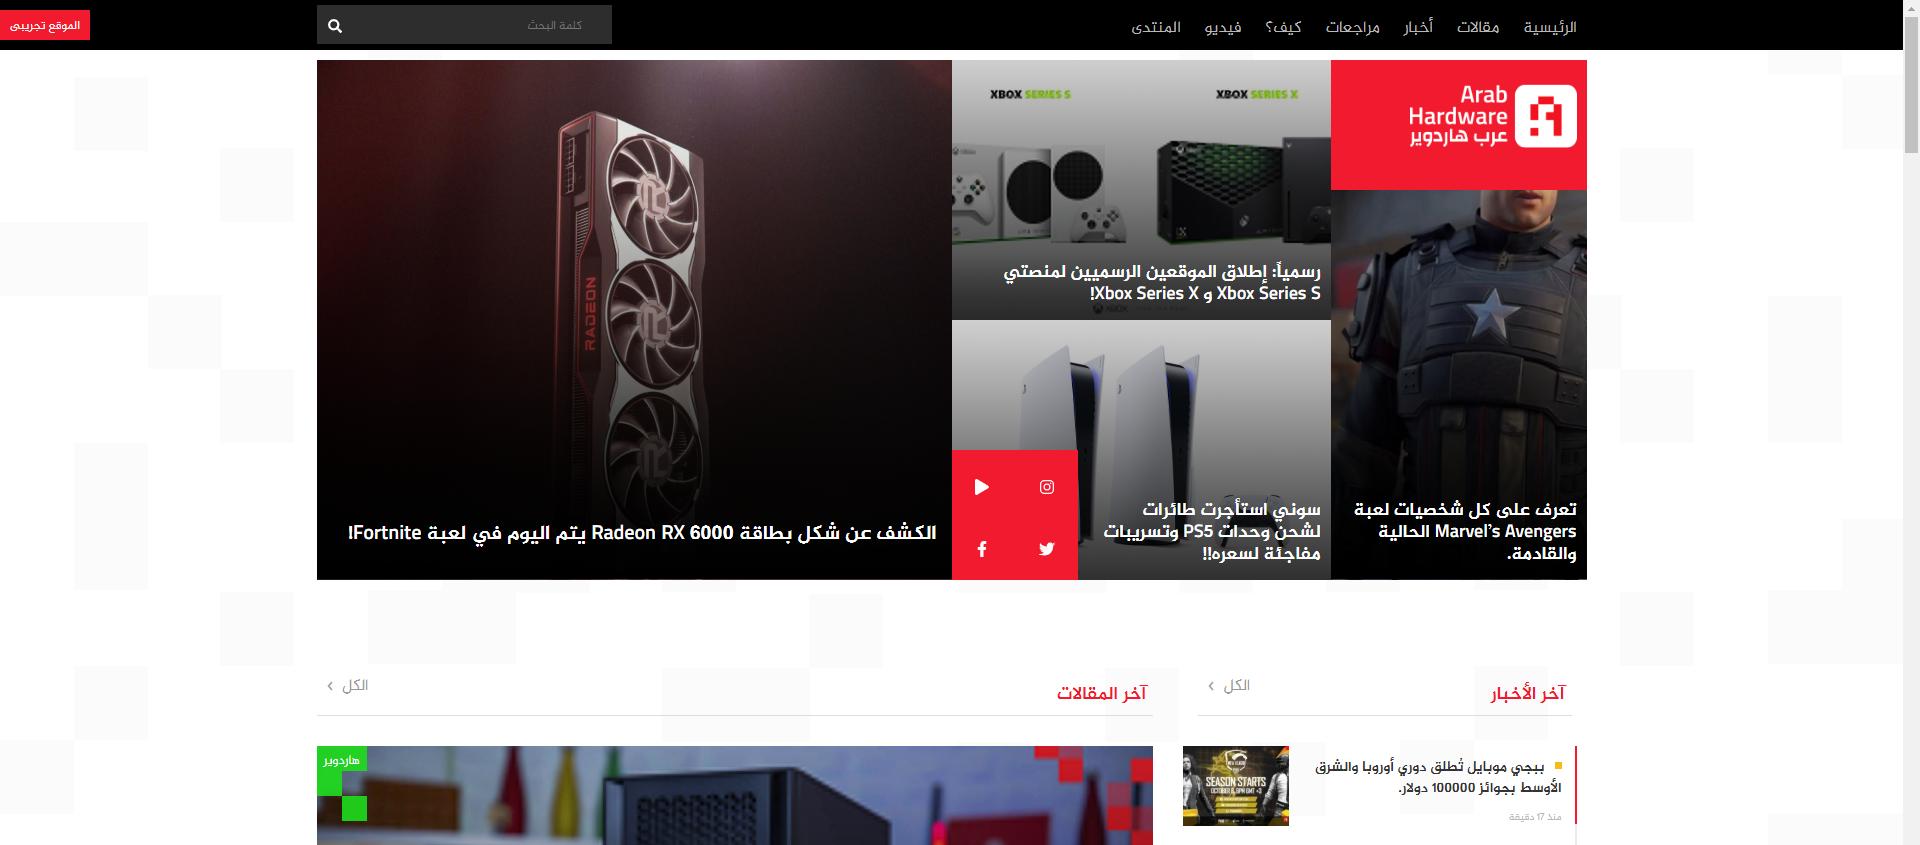 ArabHardware Site